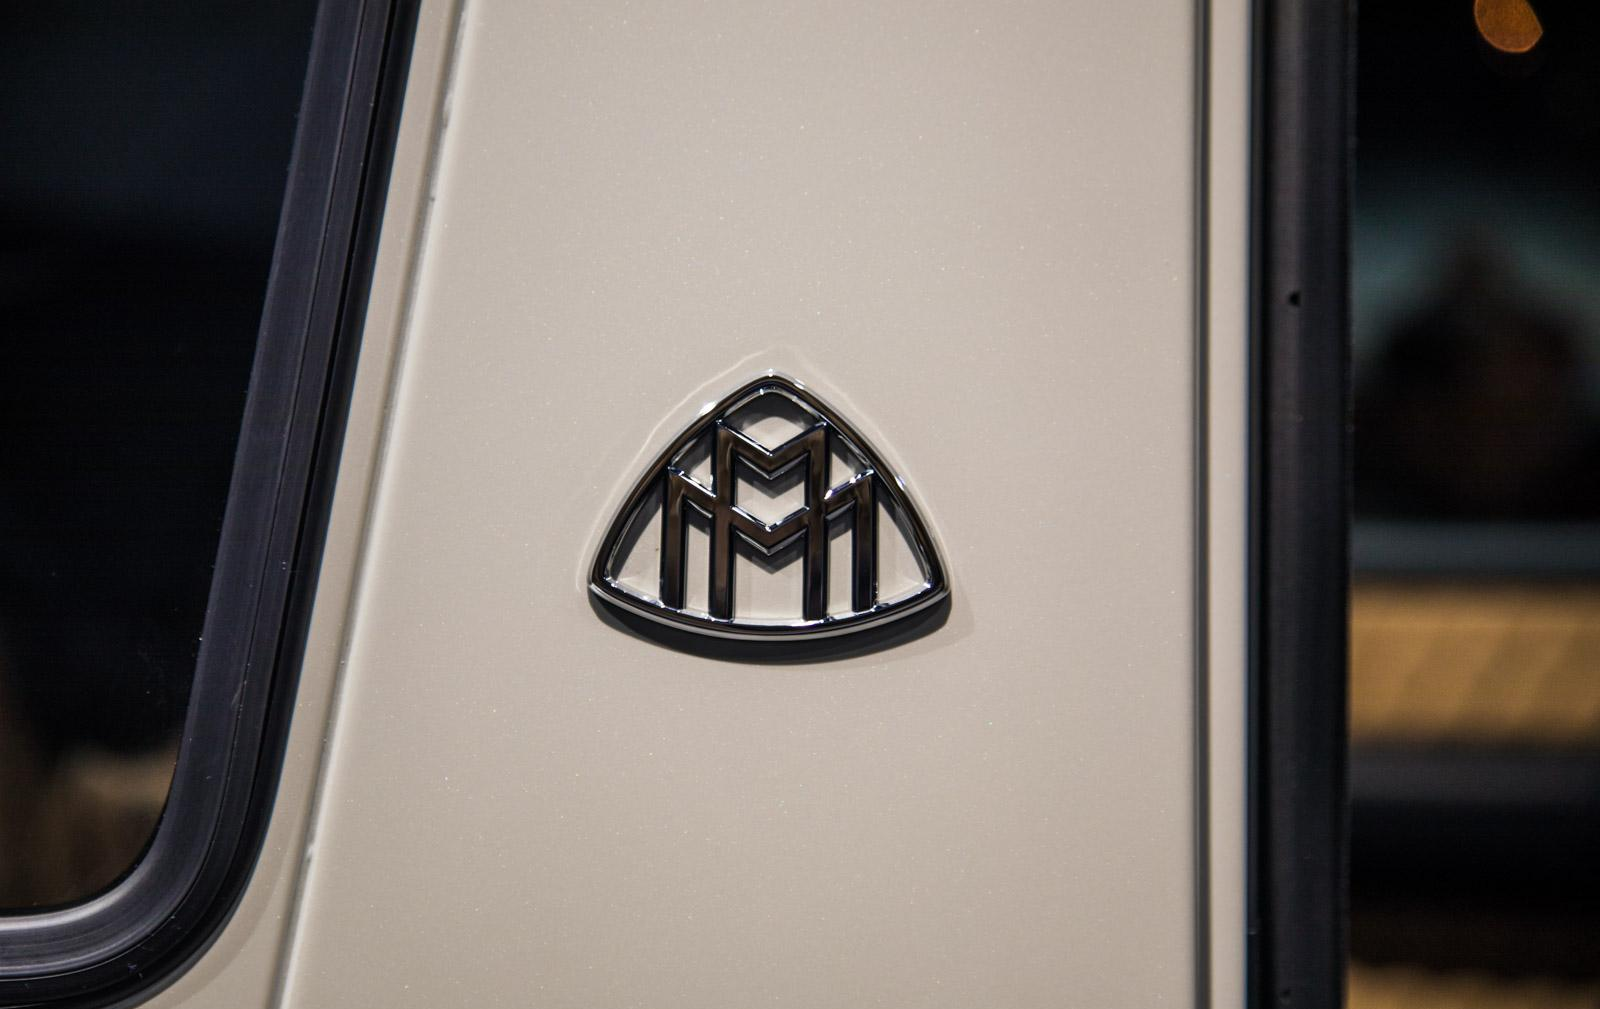 Mercedes_Maybach_G_650_Landaulet_006